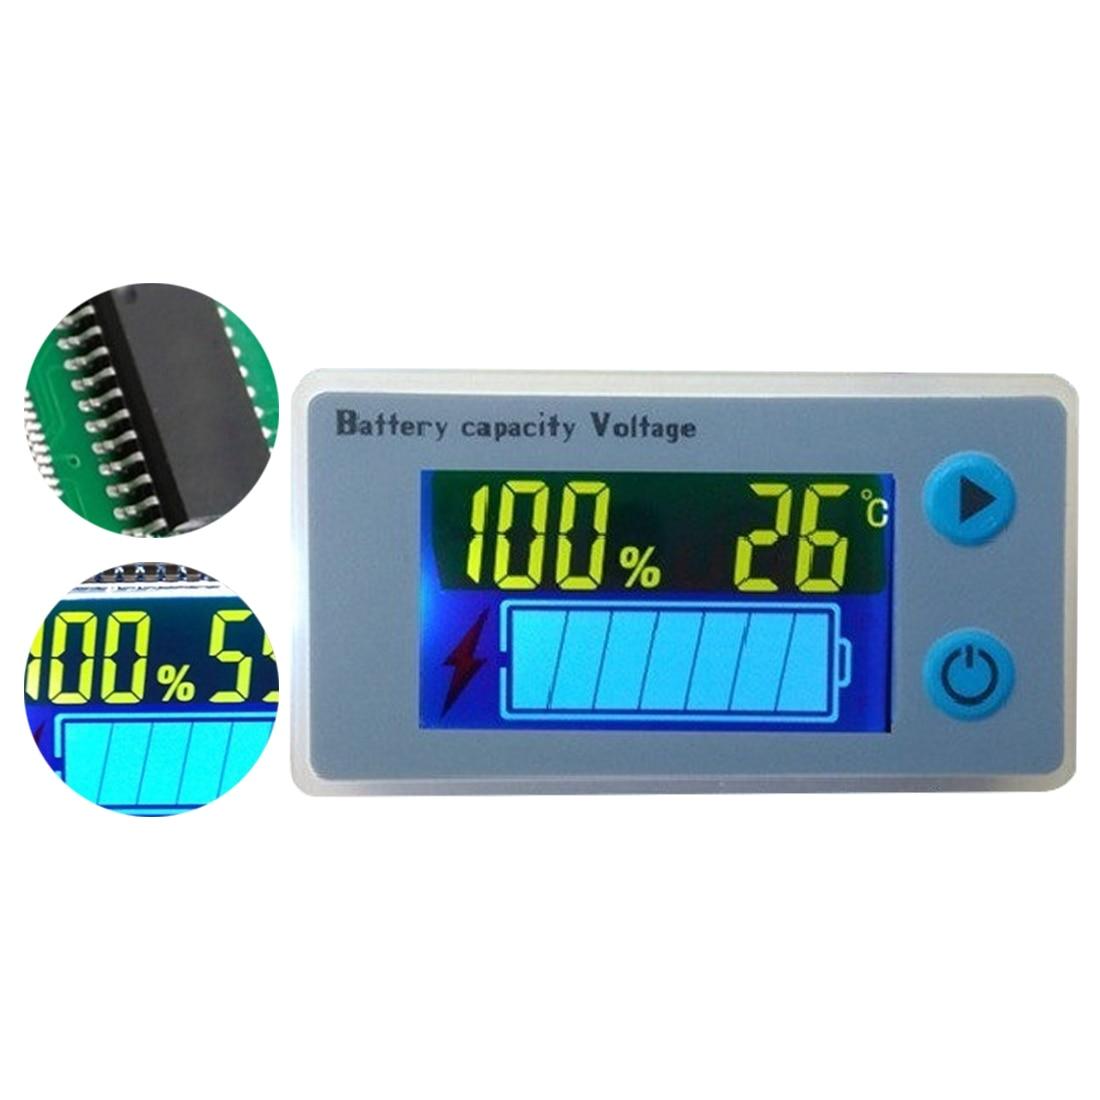 Universal LCD Car Acid Lead Lithium Battery Capacity Indicator Digital Voltmeter Voltage Tester Monitor JS-C33  10-100V